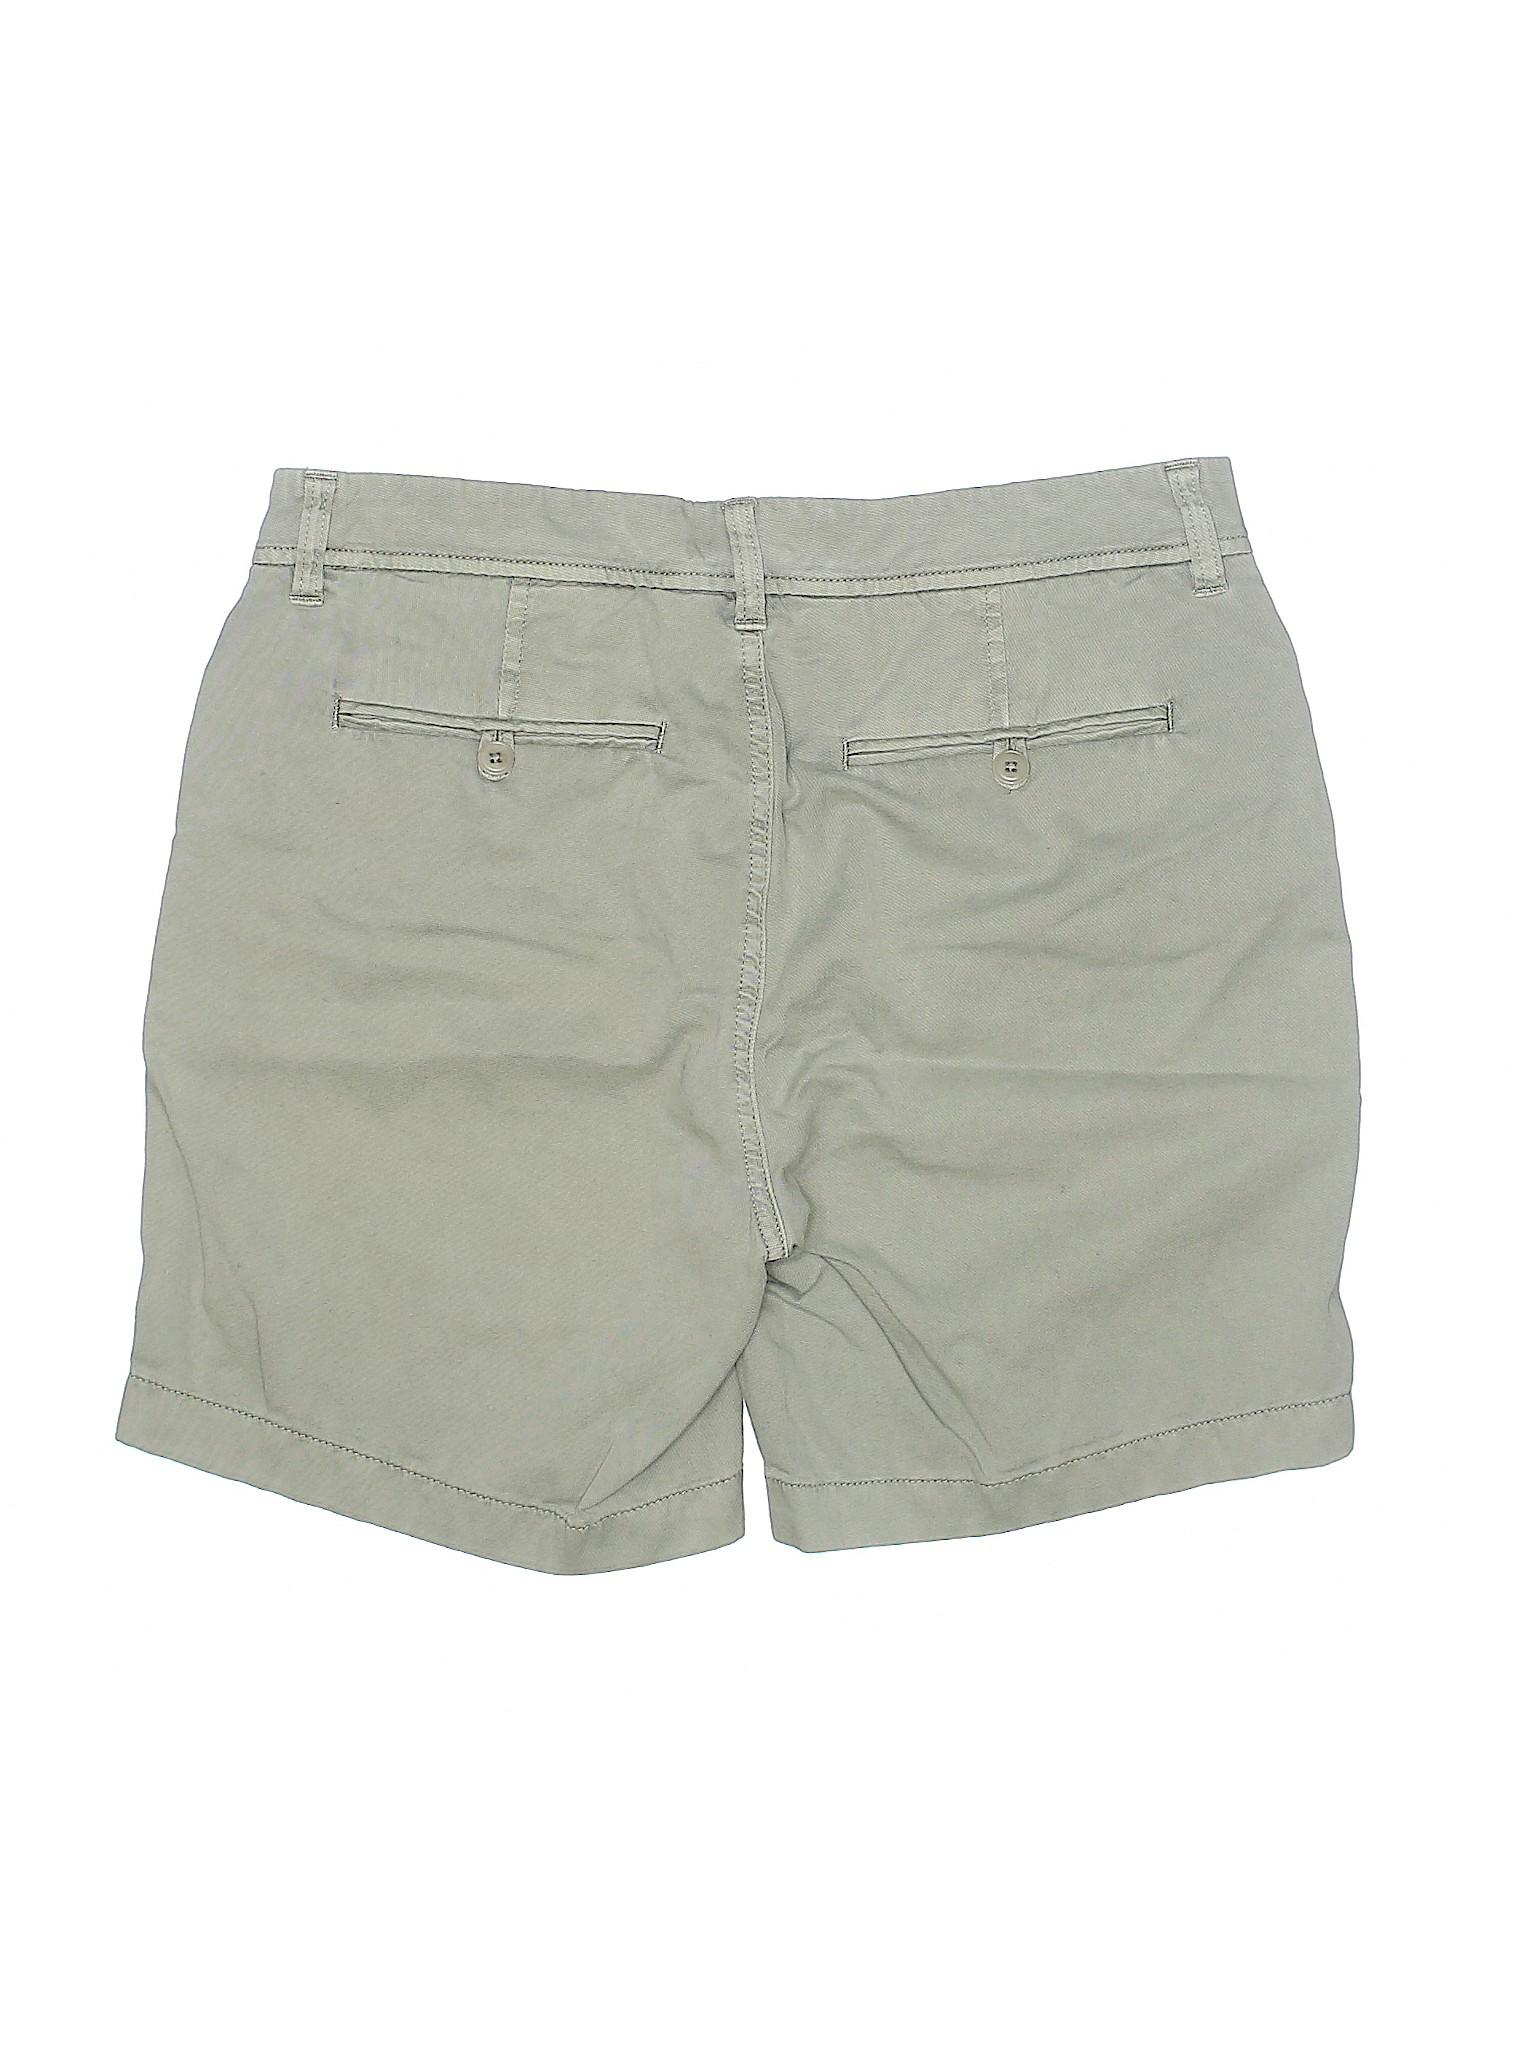 Shorts J leisure Crew Boutique Khaki gHqACcxUww